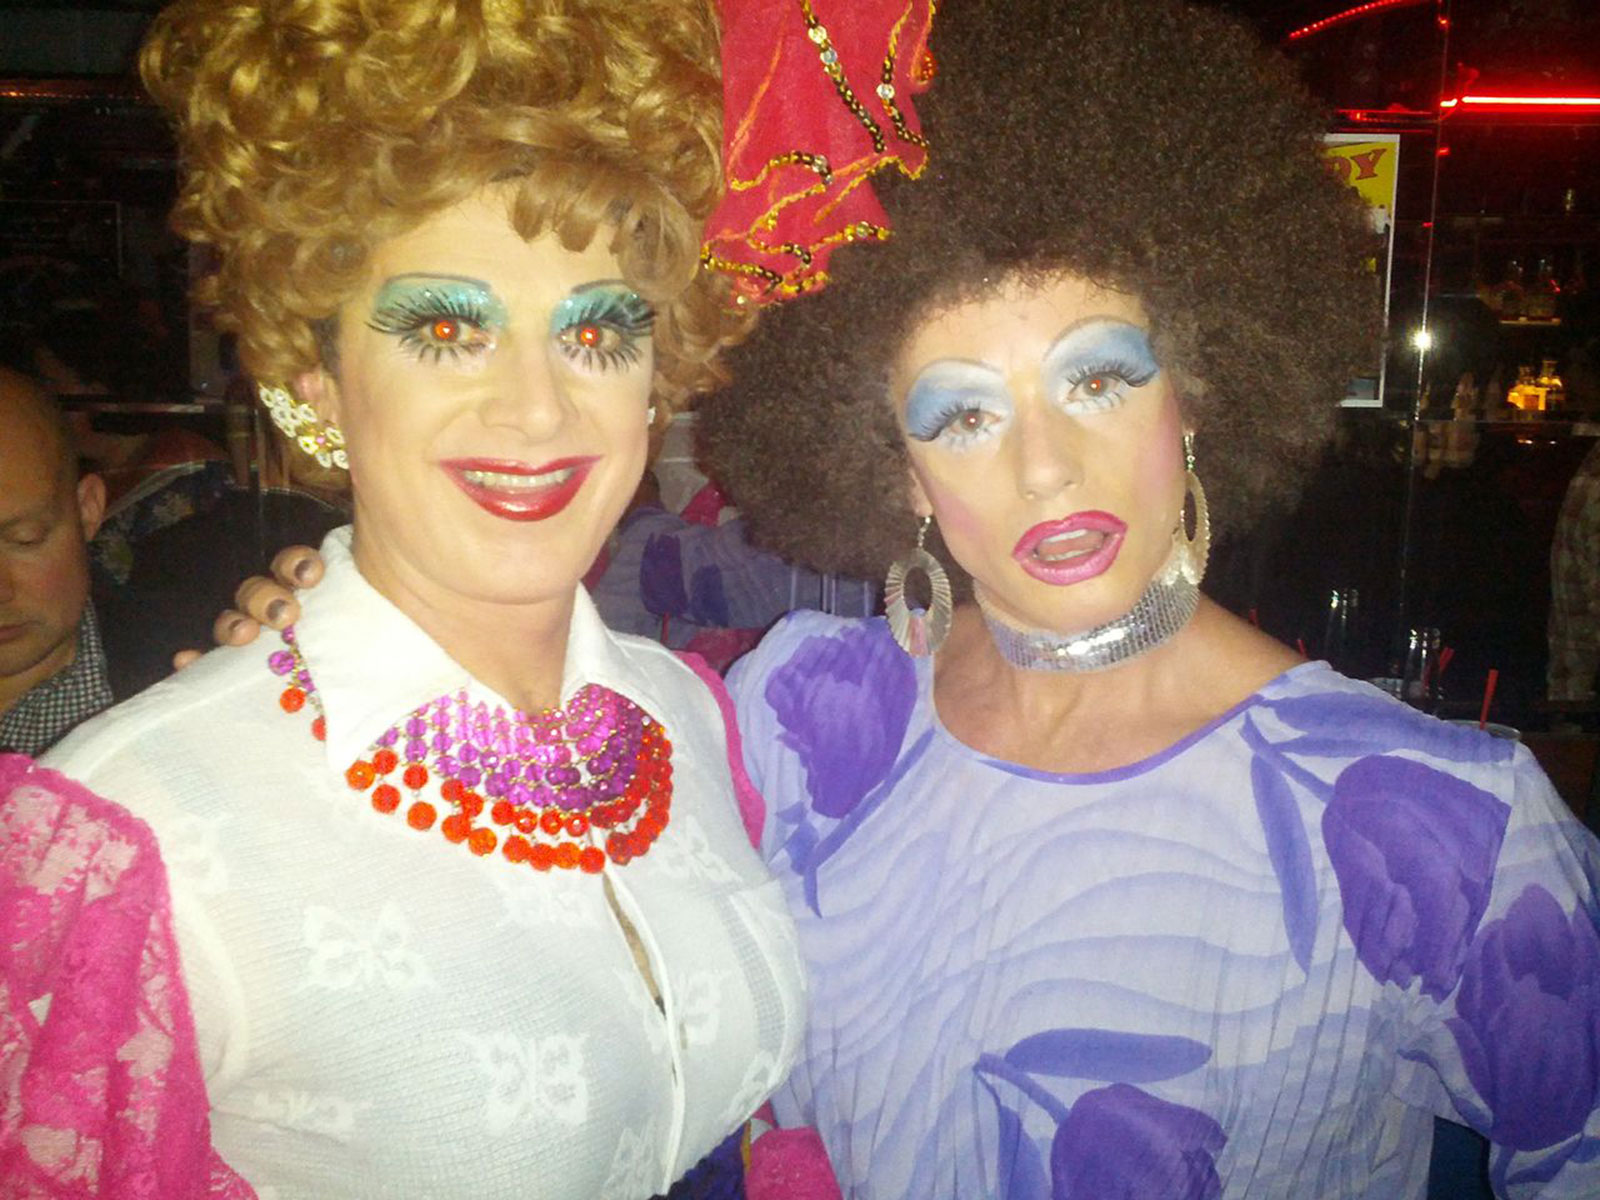 Frieda Laye (left) and Sandy Shorts at a fundraiser at Esta Noche May 18.